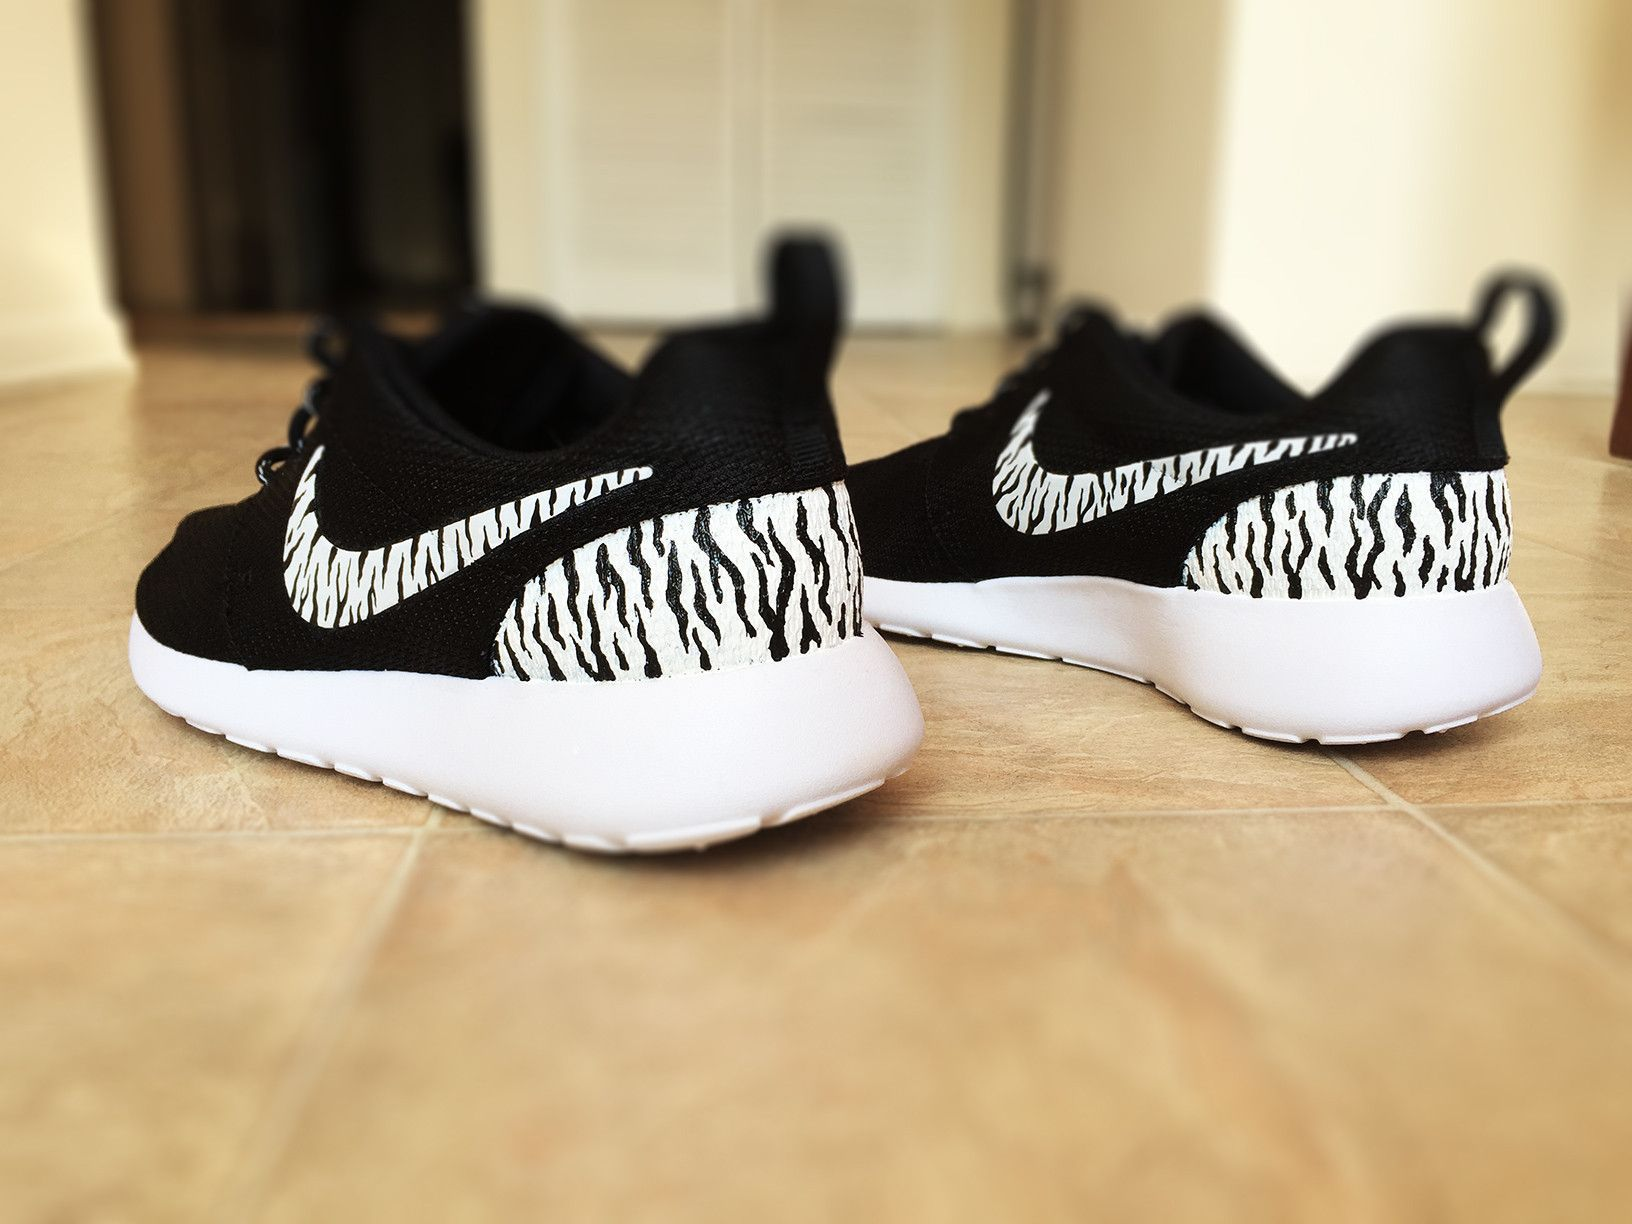 Custom Nike Roshe Zebra Print design